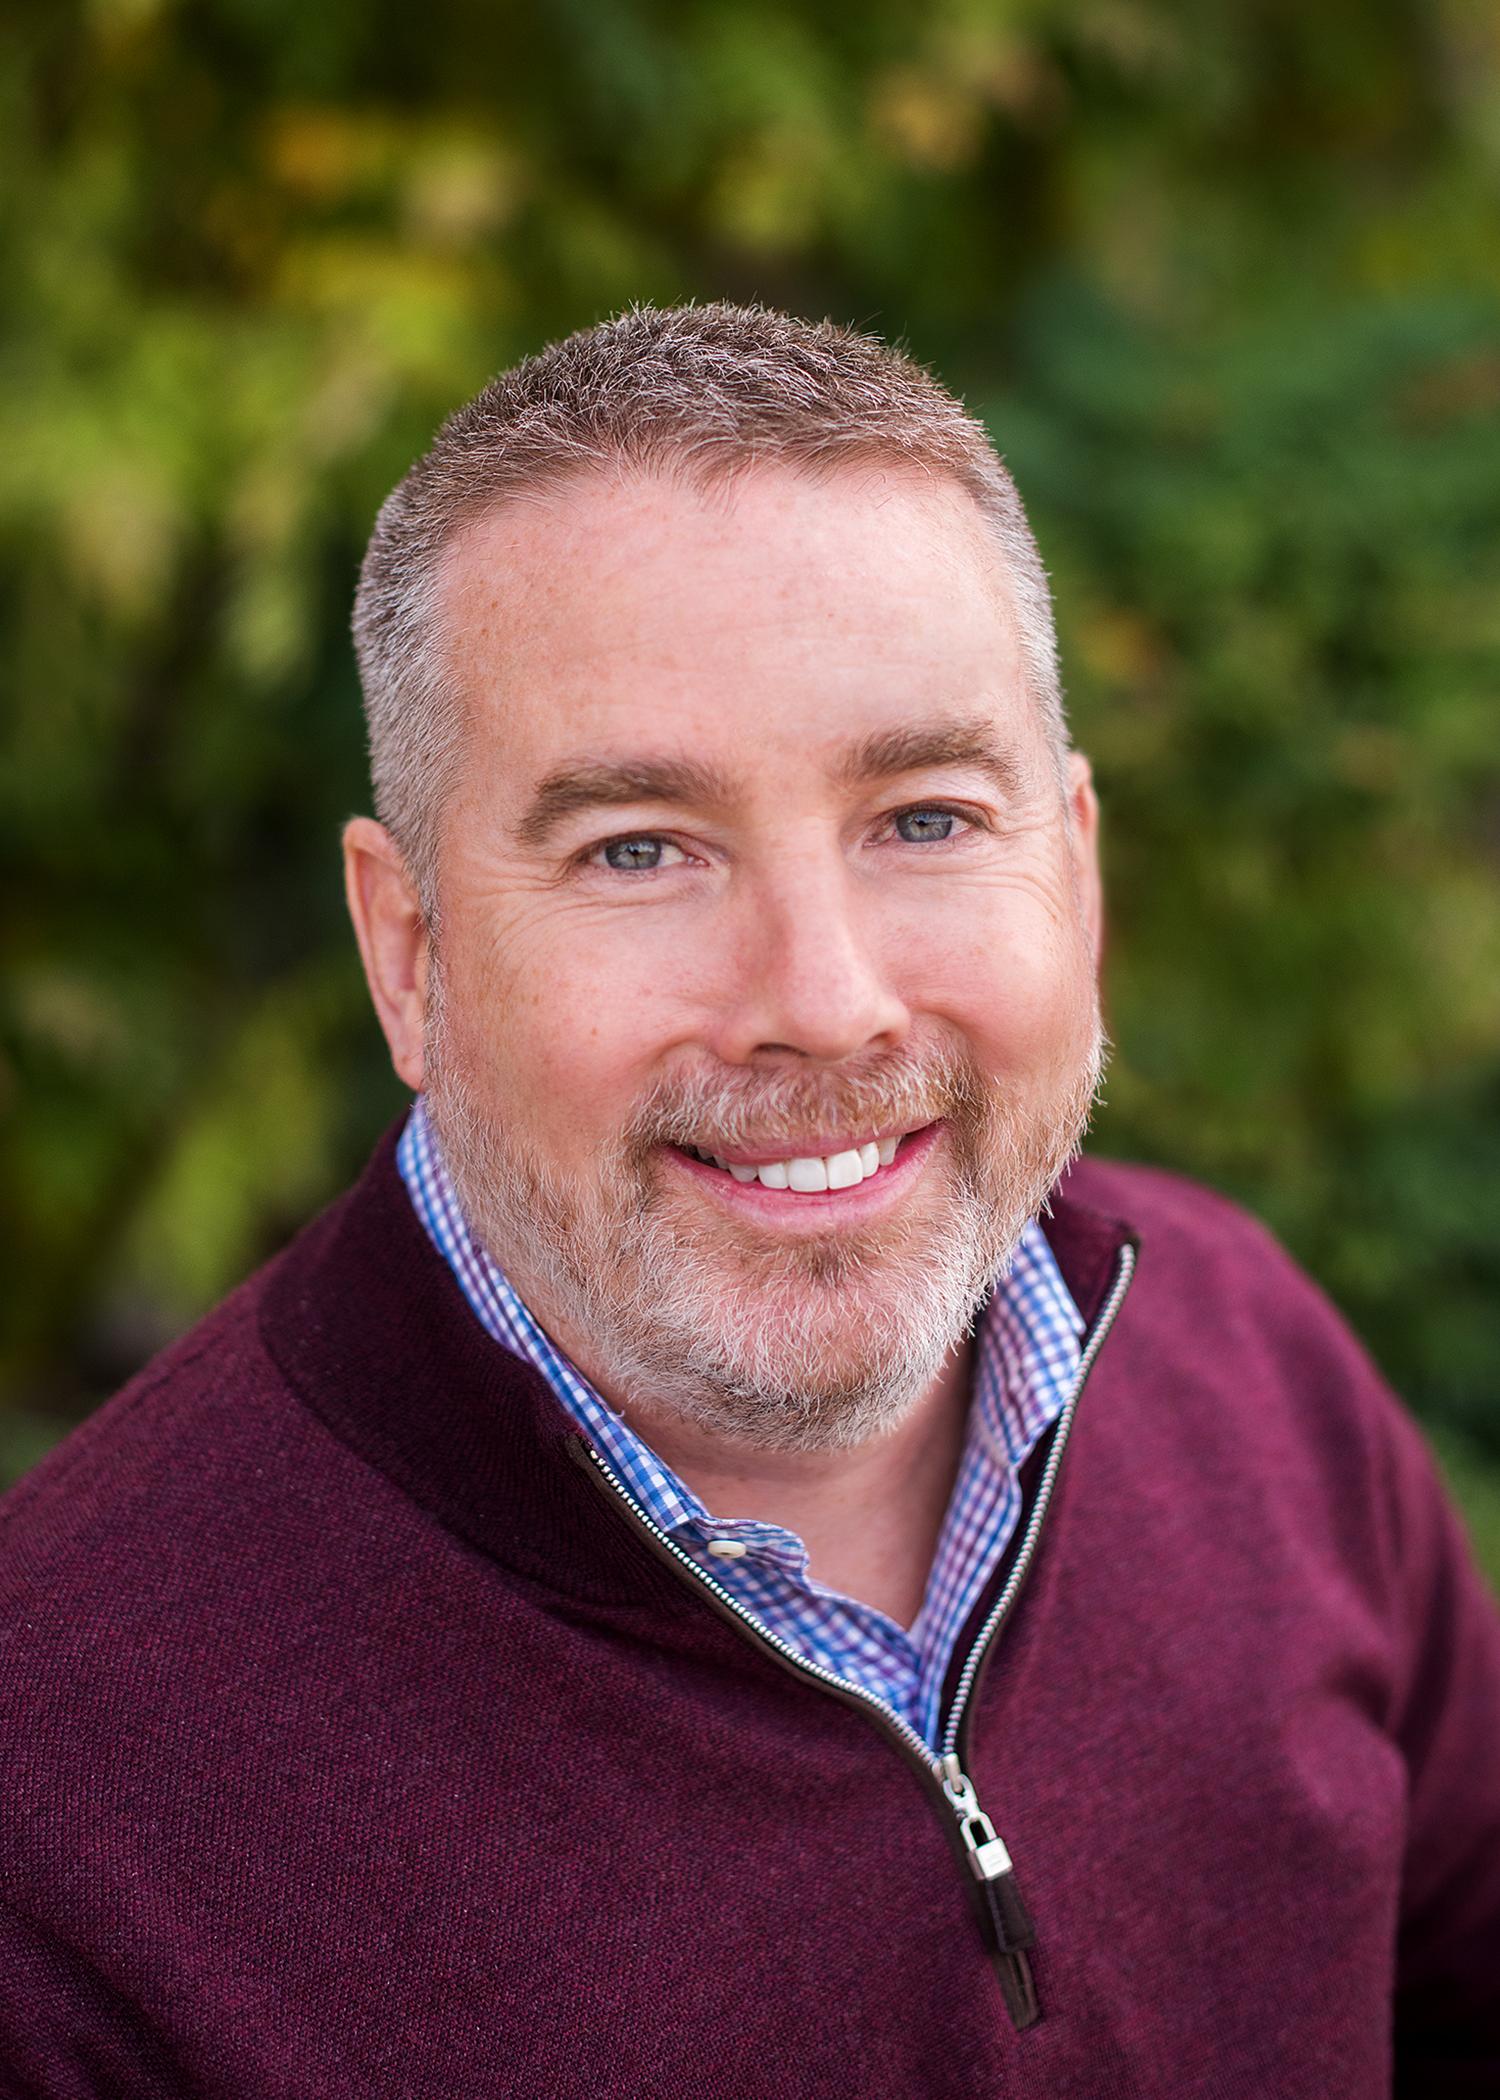 Doug Sproul